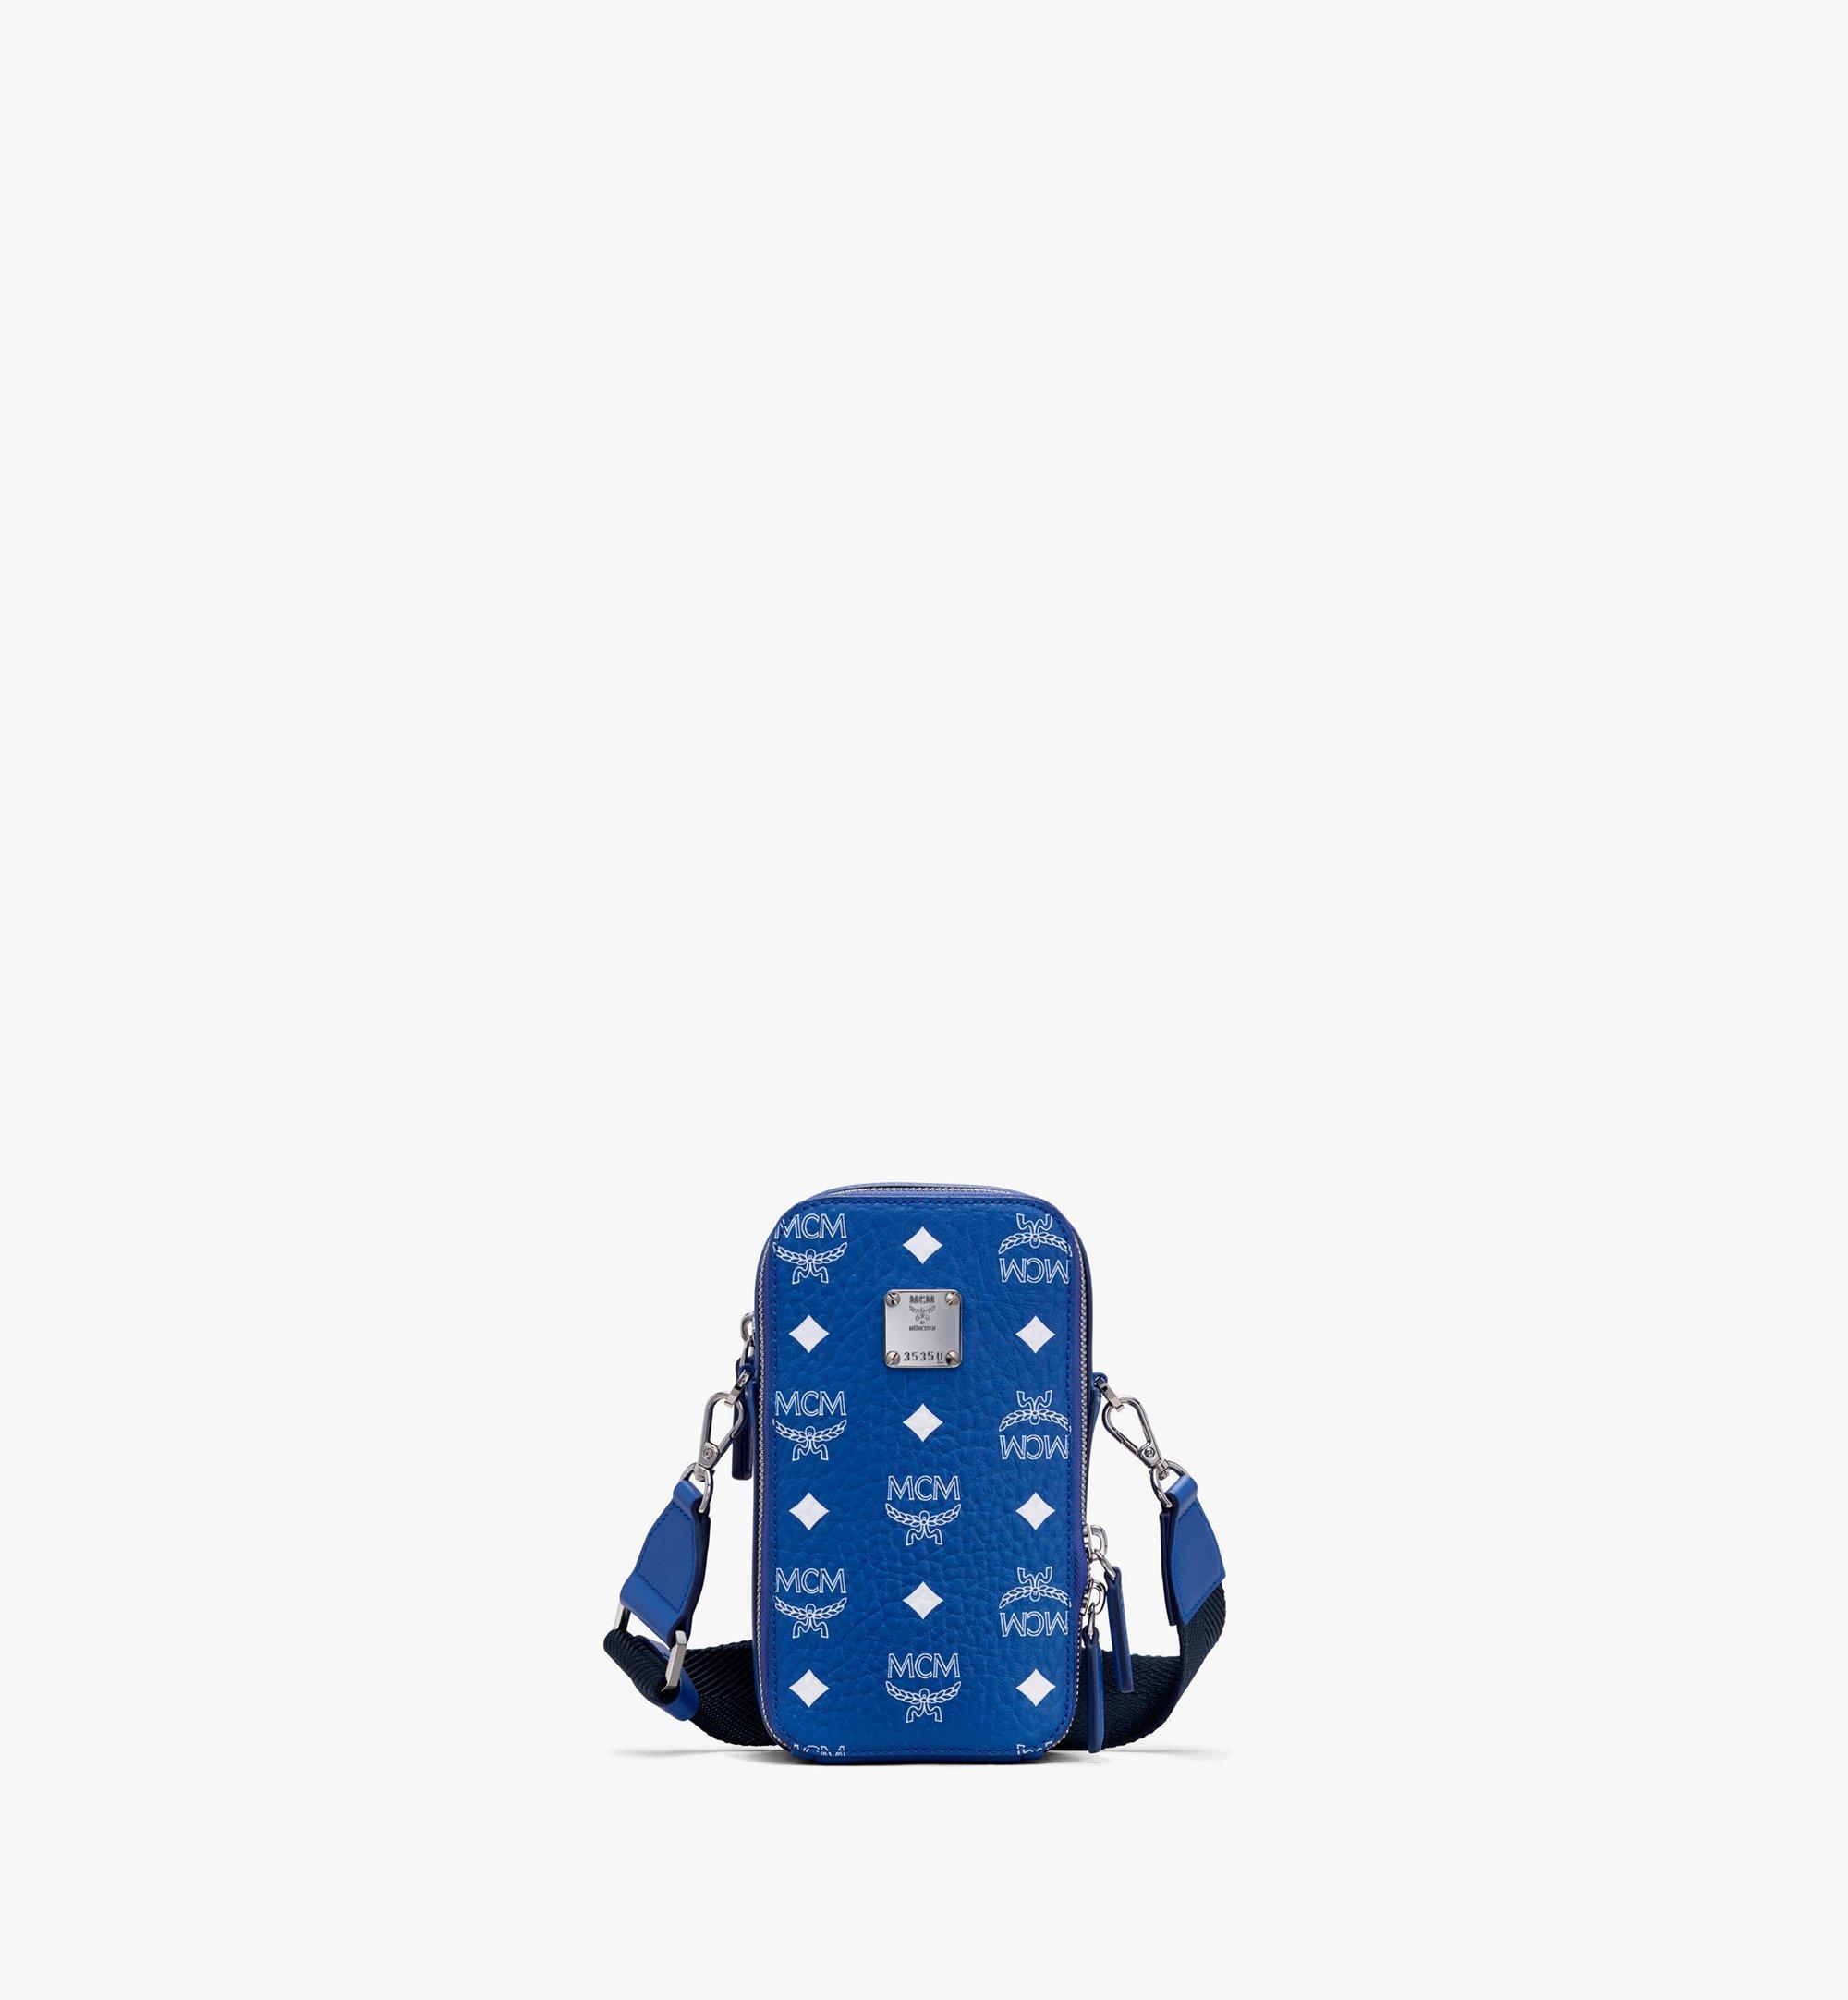 MCM N/S Crossbody-Tasche in Visetos Original Blue MWRASVI02H1001 Alternate View 1